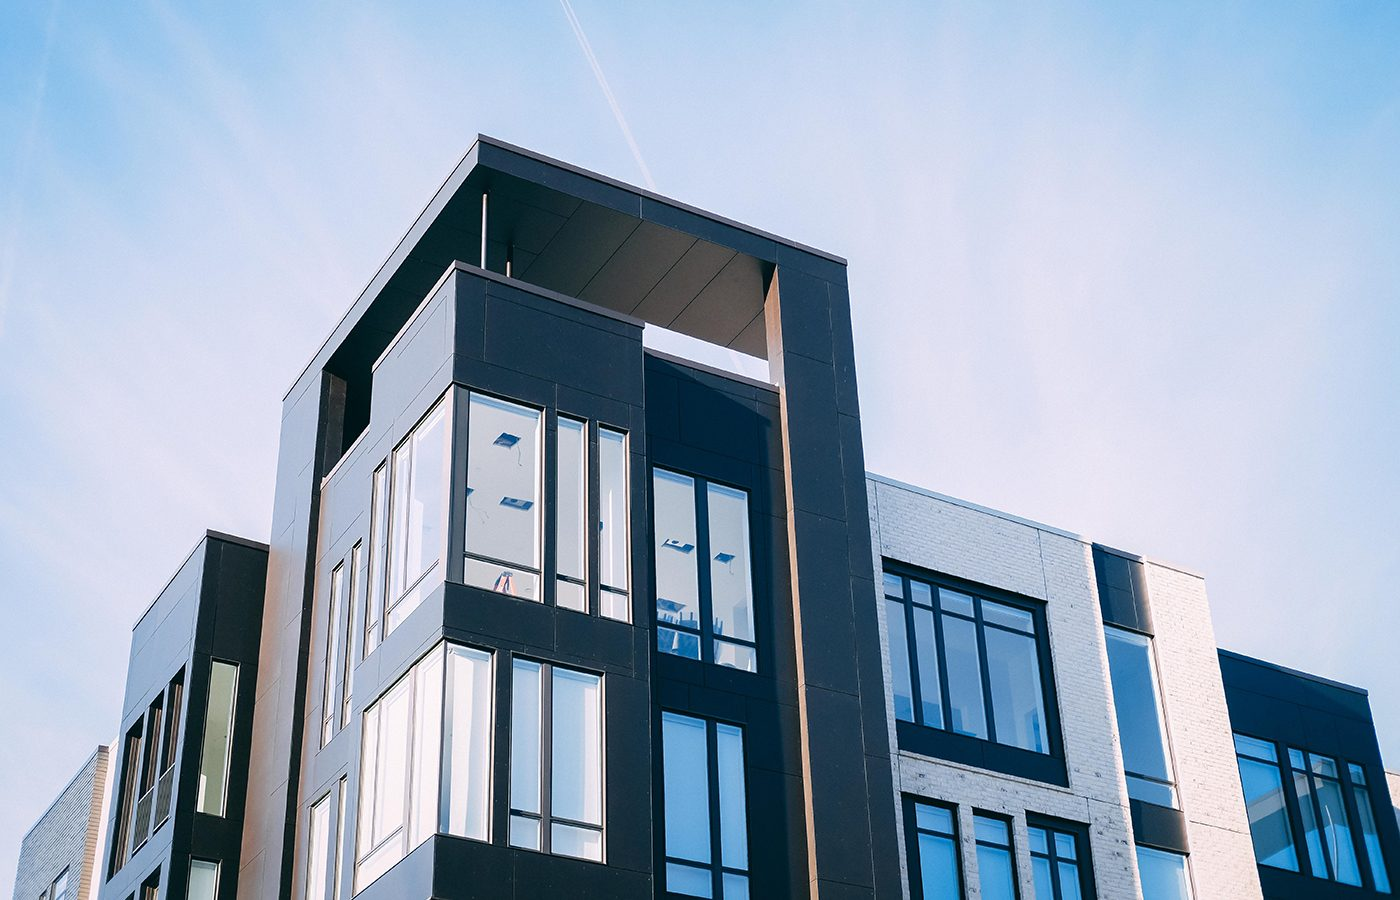 Penthouse of condo building